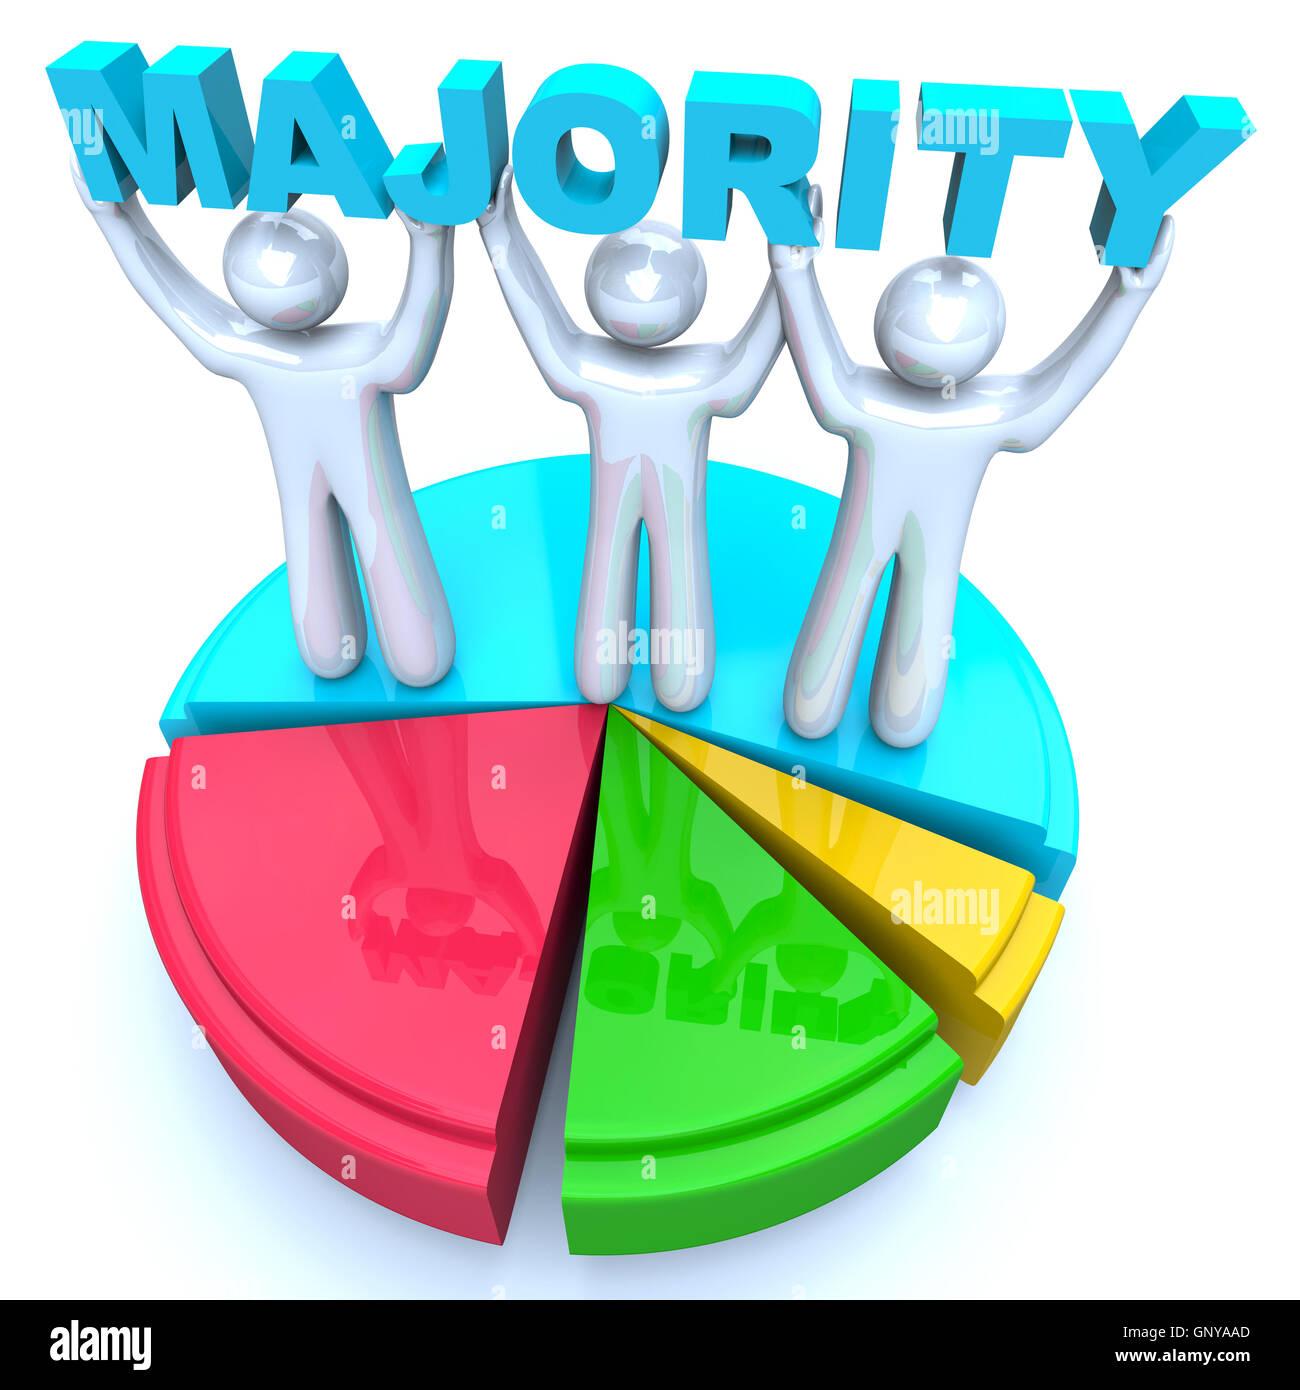 Majority rule people holding word on pie chart winners stock photo majority rule people holding word on pie chart winners nvjuhfo Images